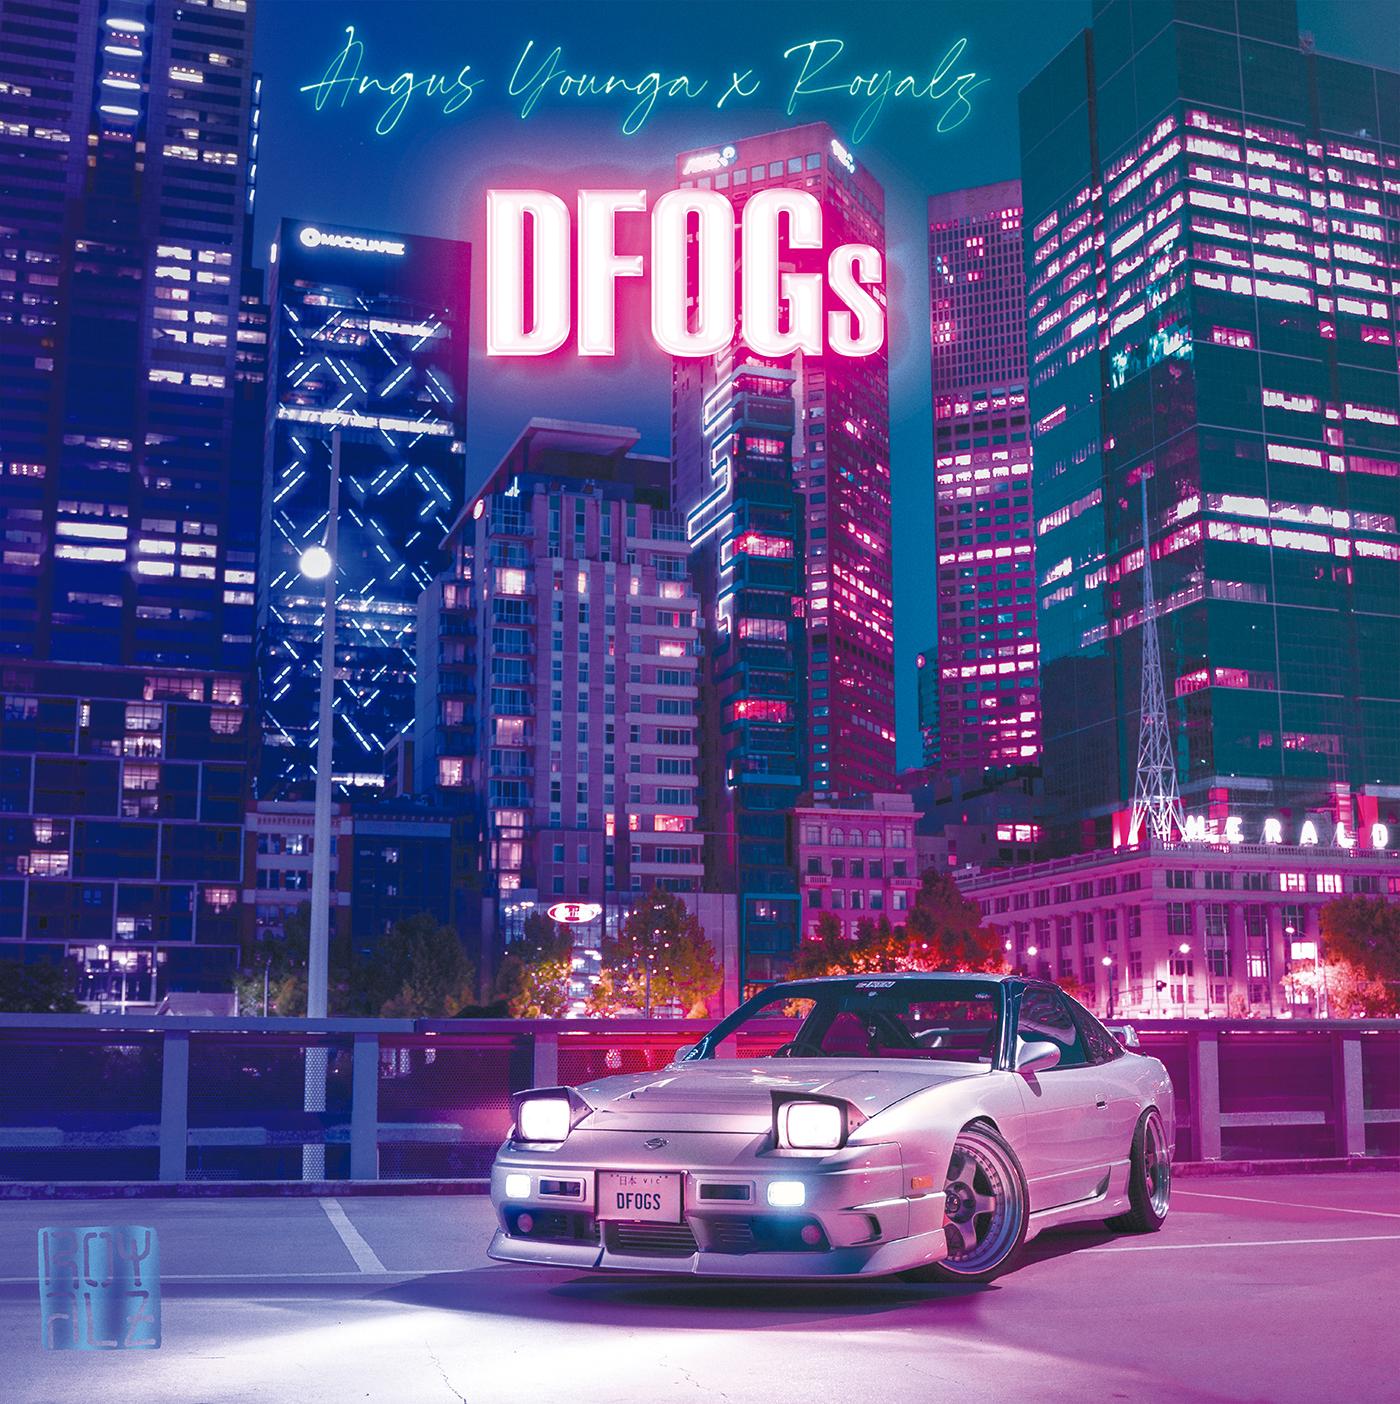 Angus Younga x Royalz - DFOG's